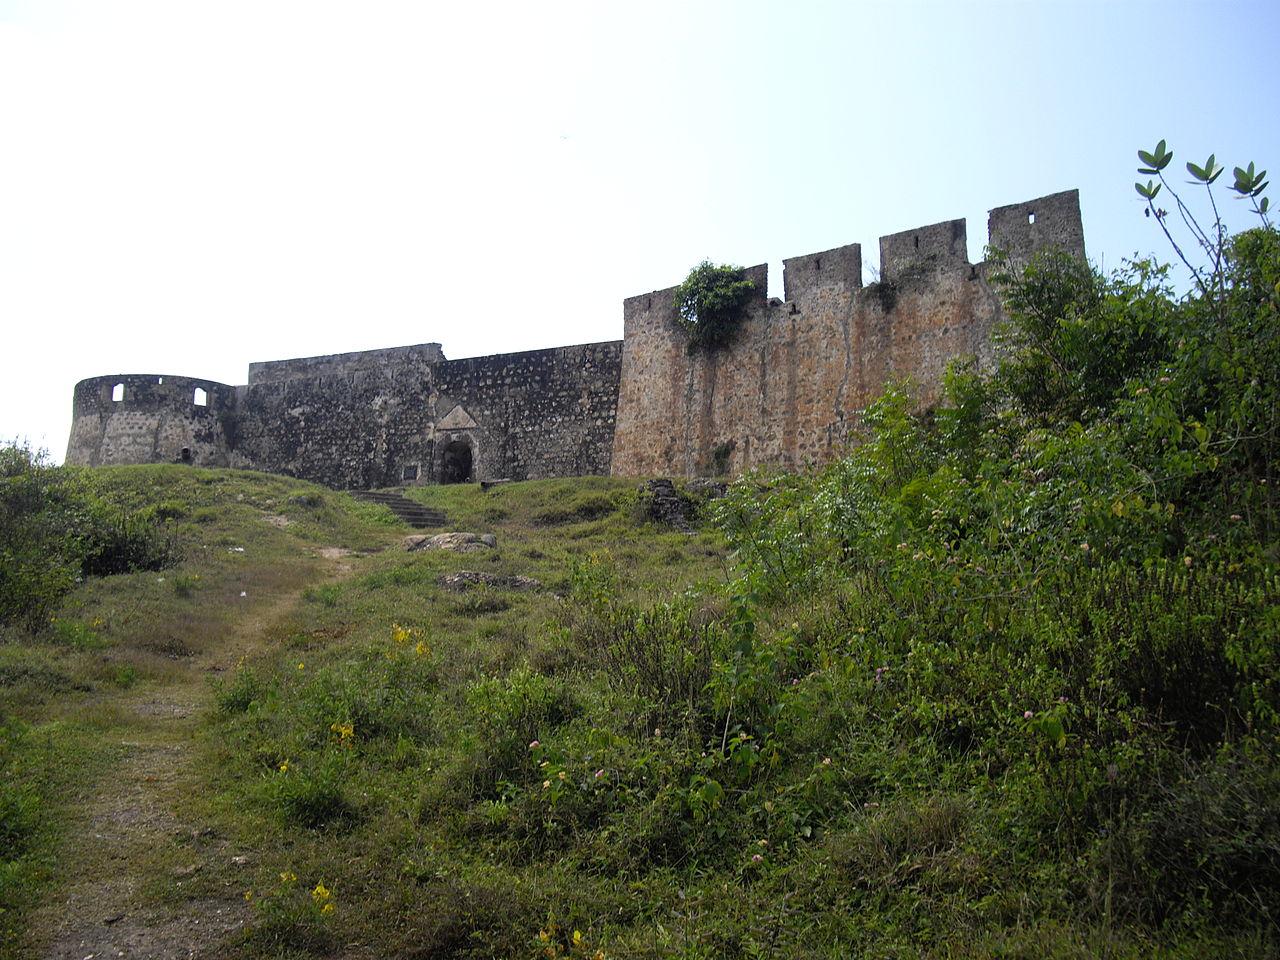 File:Ghana, Abandze, Fort Amsterdam (Cormantijn), Hoofdingang